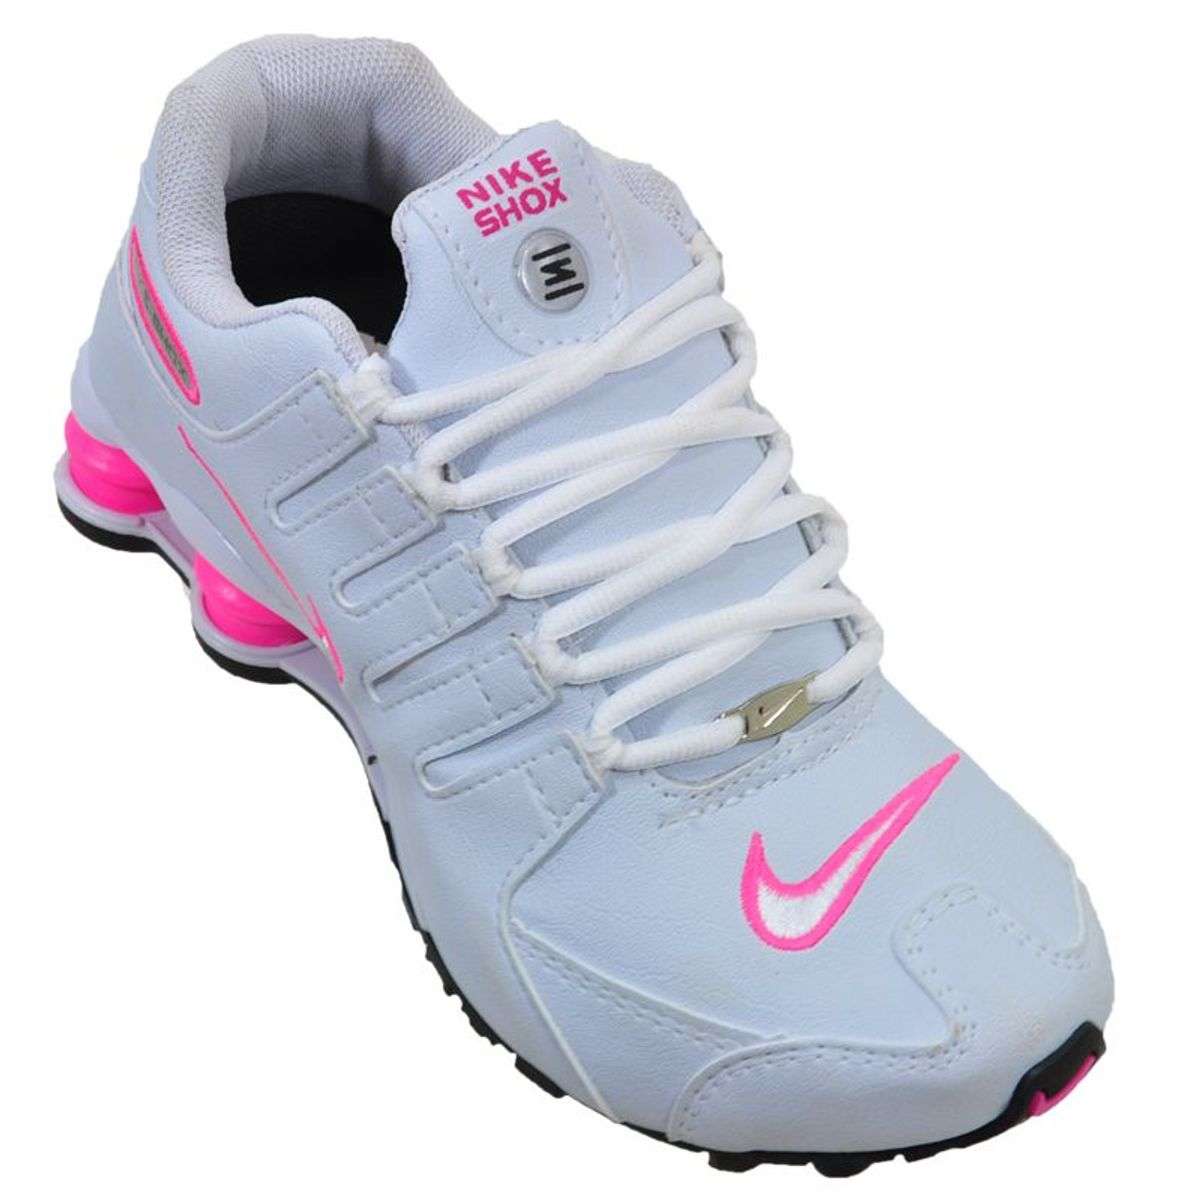 nike shox nz feminino branco com rosa